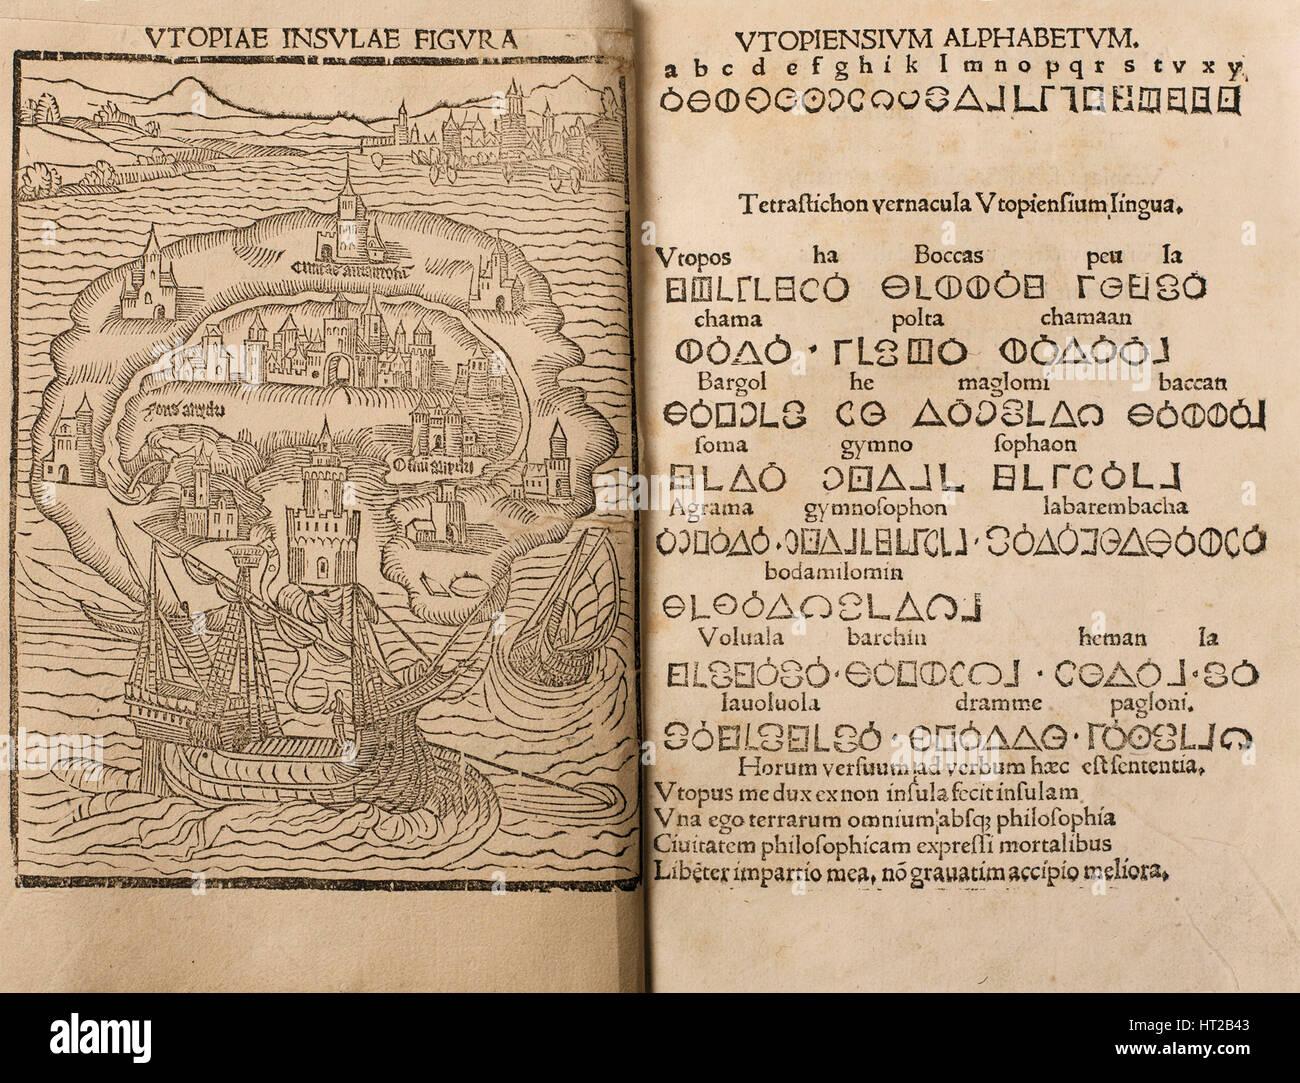 Utopia by Thomas More, 1516. Artist: Anonymous - Stock Image